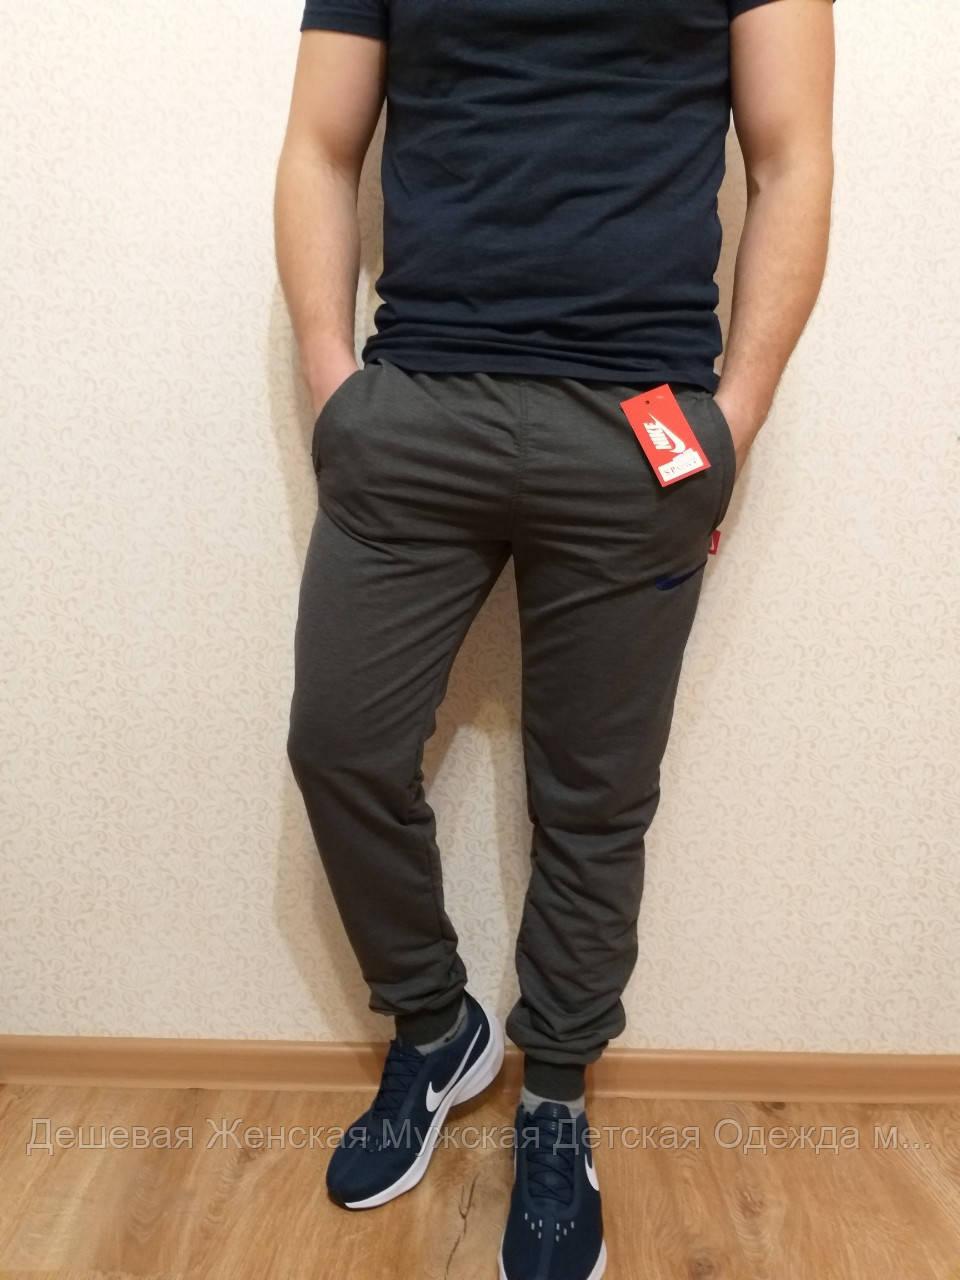 Мужские спорт штаны трикотаж вышивка